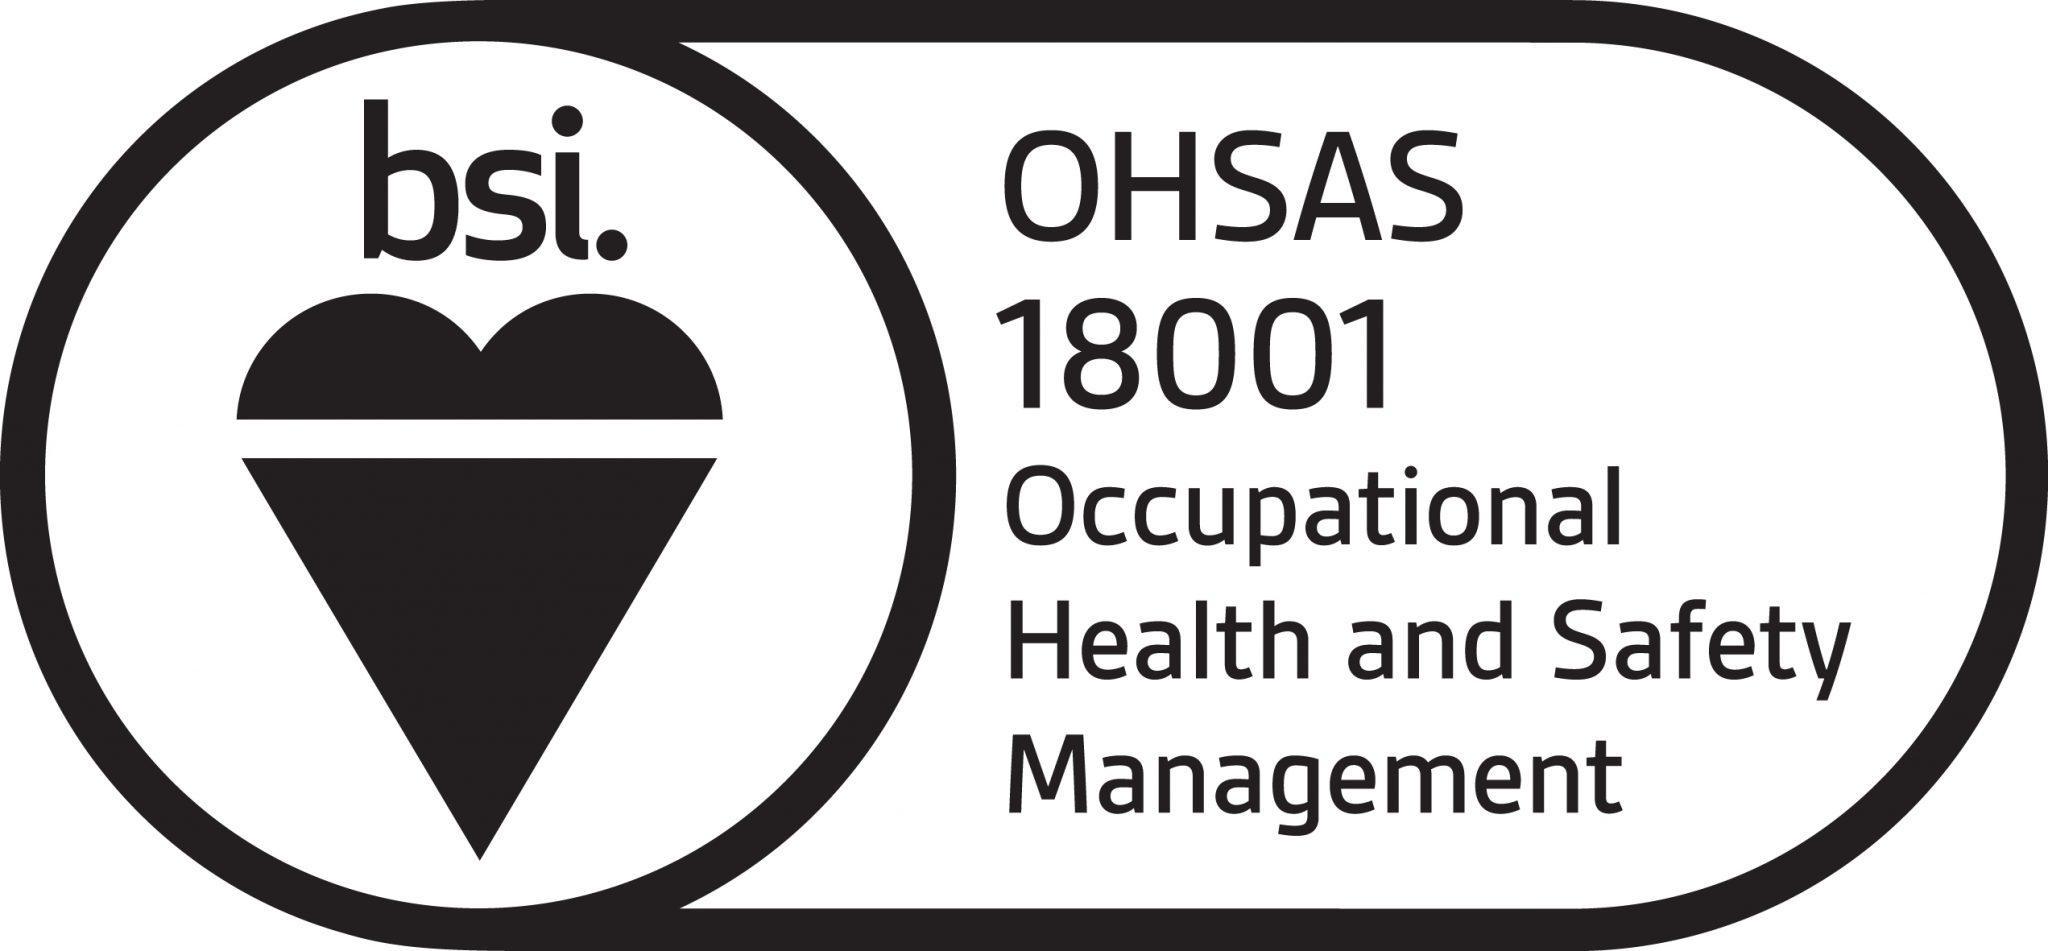 Wj Groundwater Attains Ohsas 18001 Certification Wj Uk